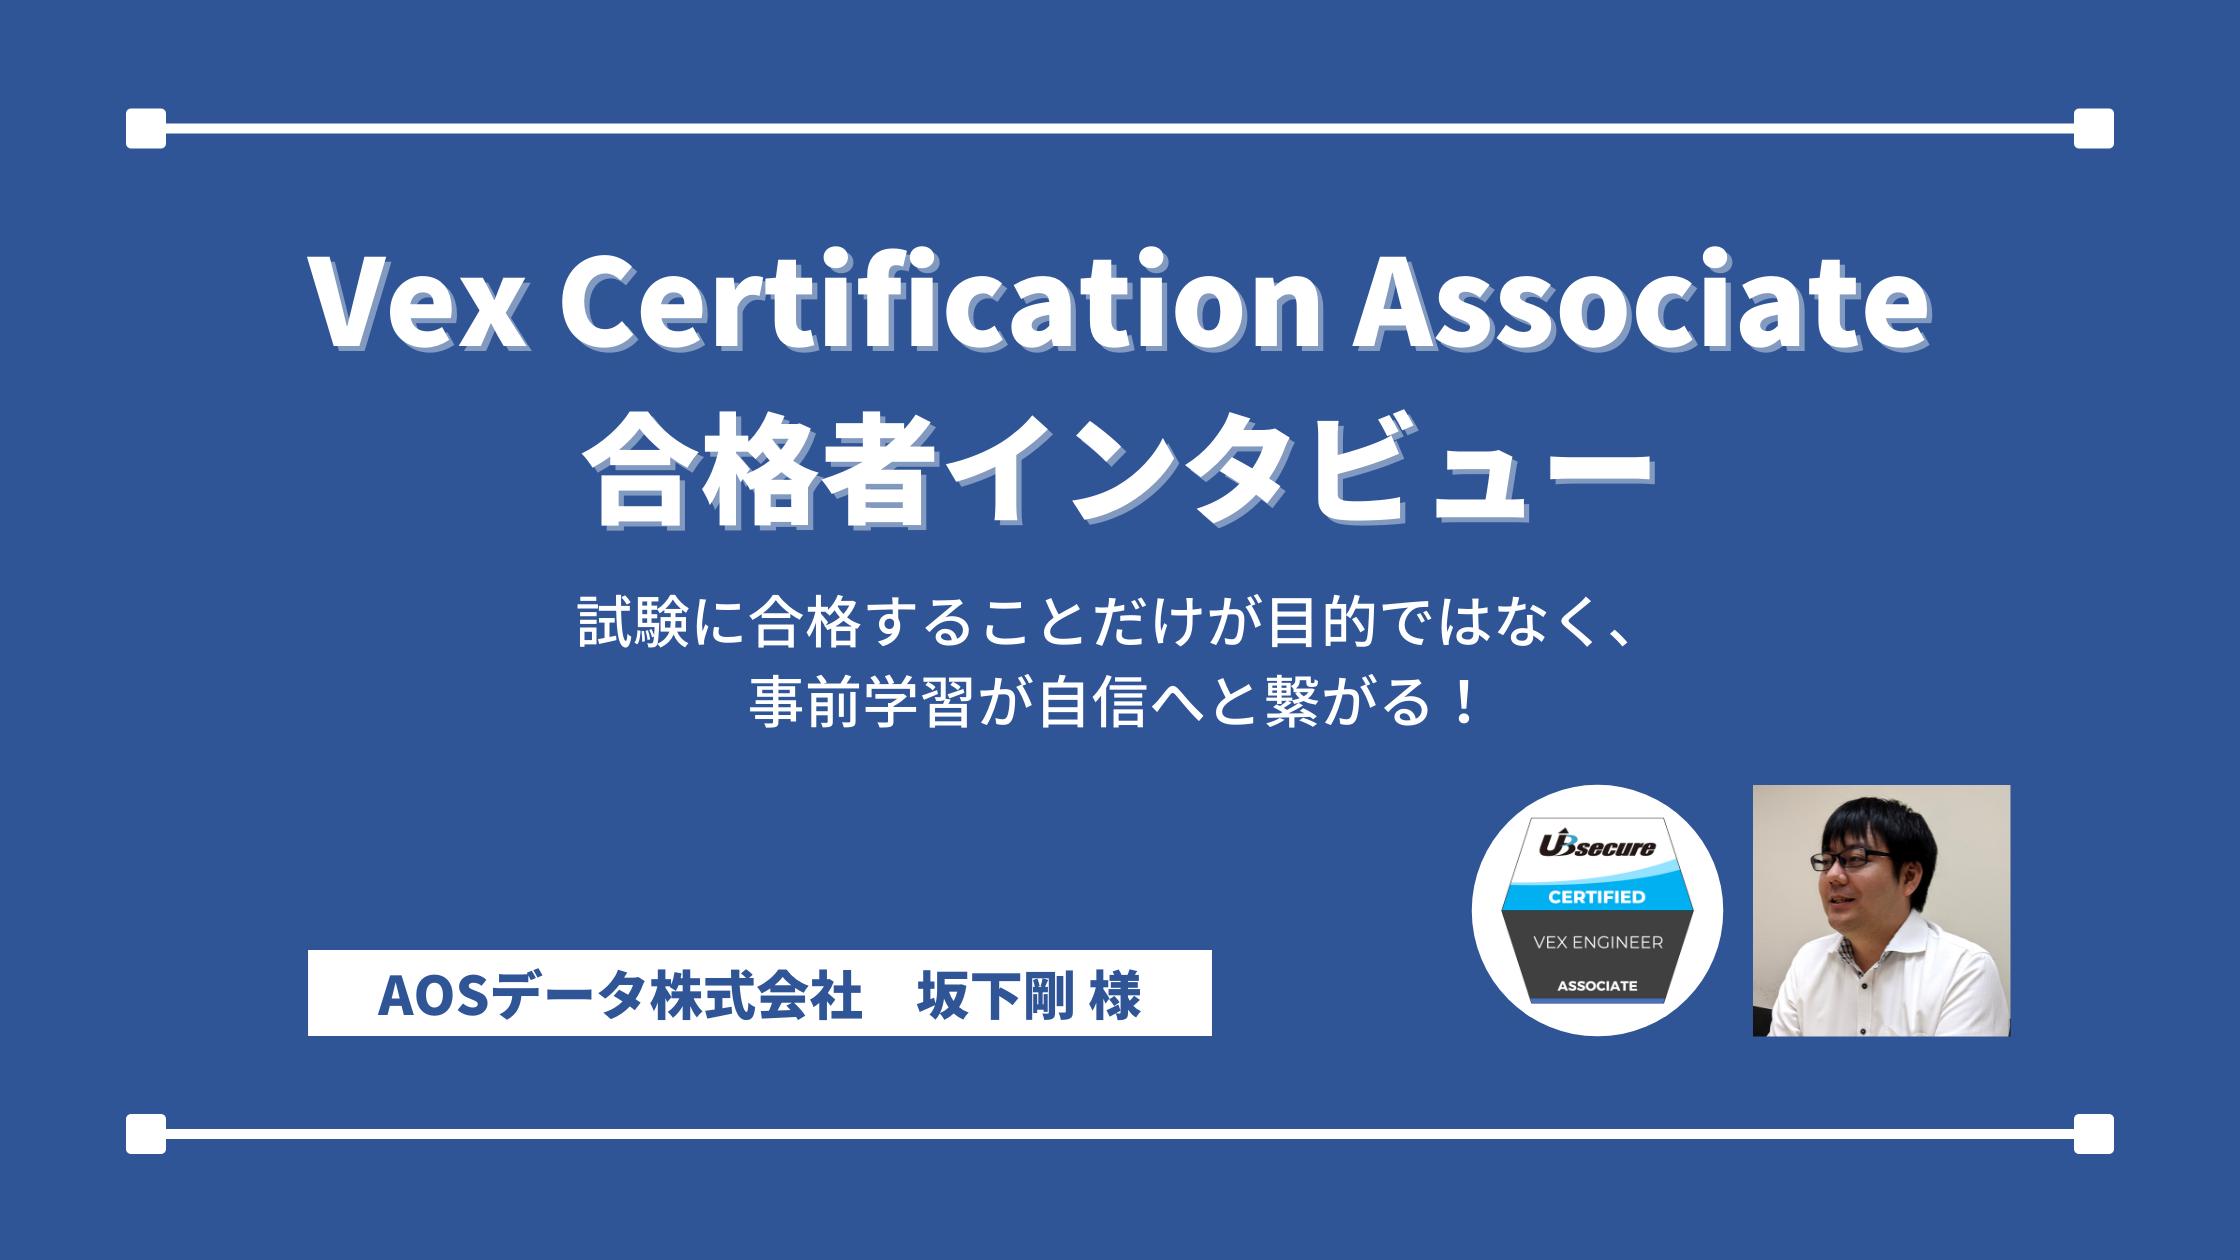 Vex Certification Associate合格者インタビュー ~試験に合格することだけが目的ではなく、事前学習が自信へと繋がる!~